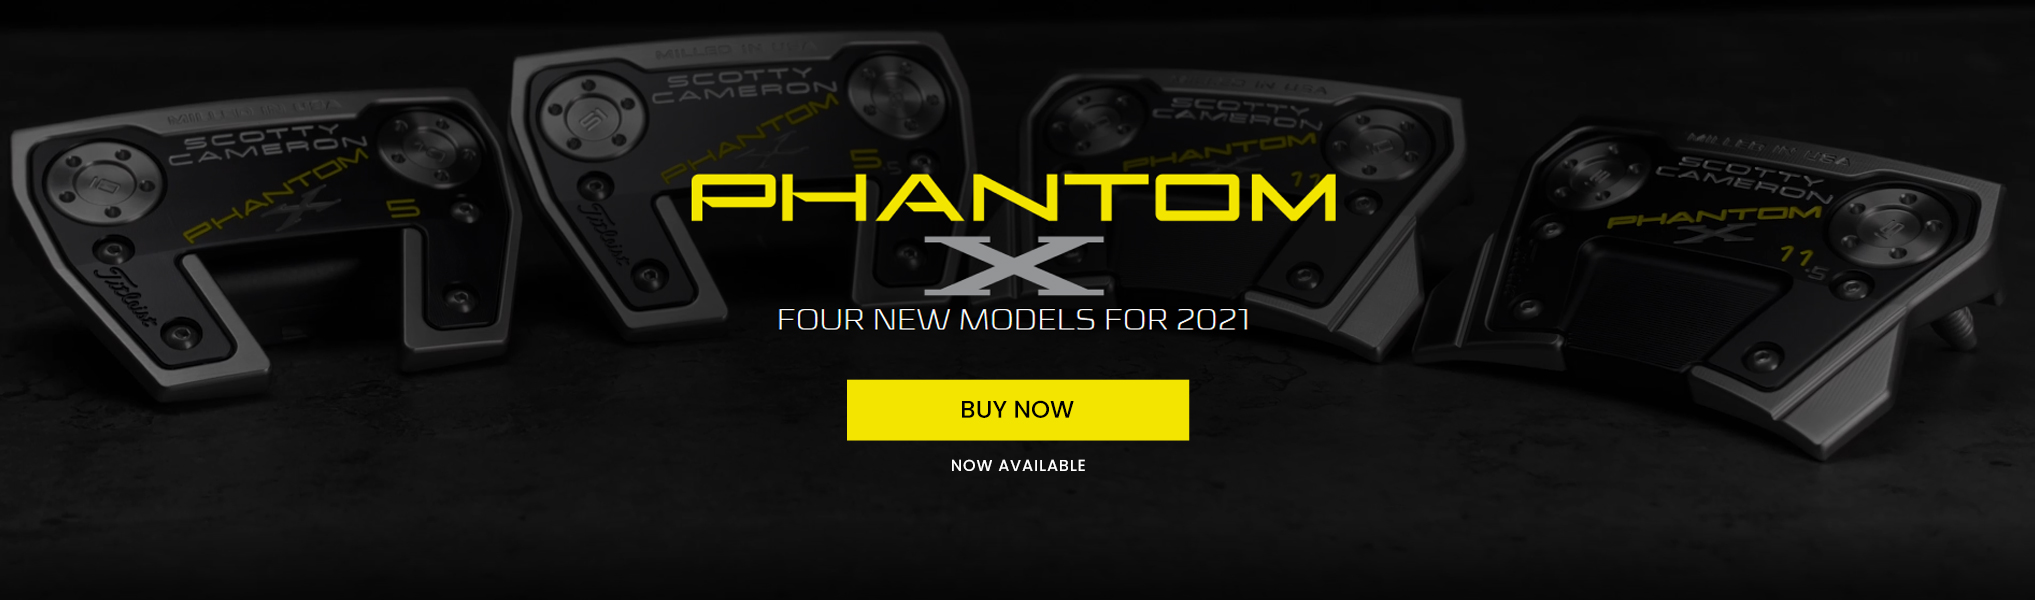 Scotty Cameron Phantom X Buy Now